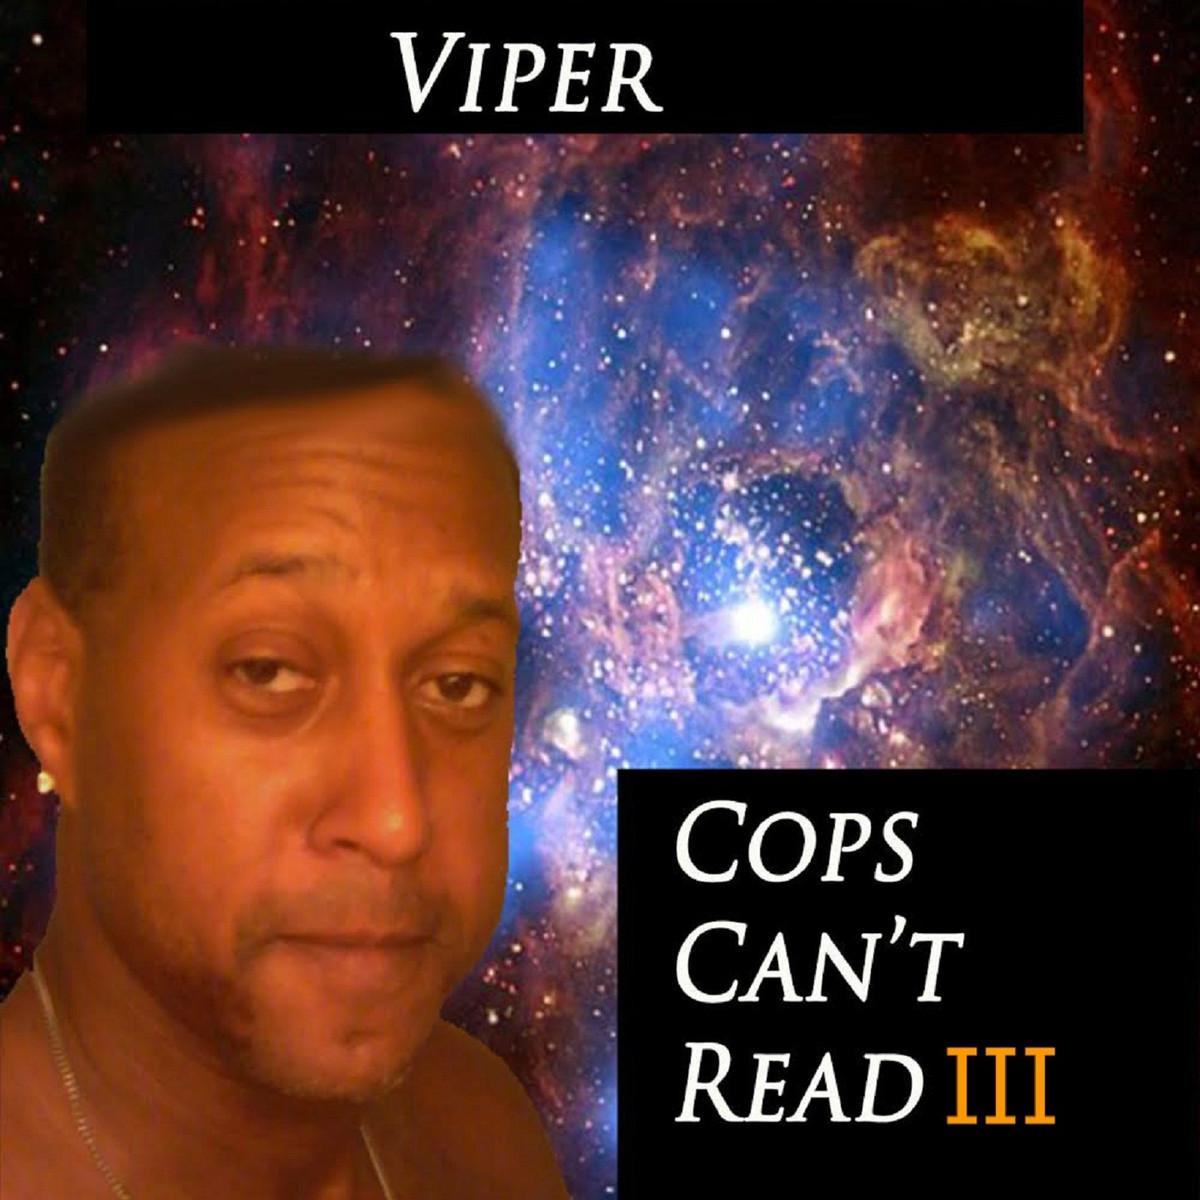 2b8 cops can't read iii viper know your meme,Viper Meme